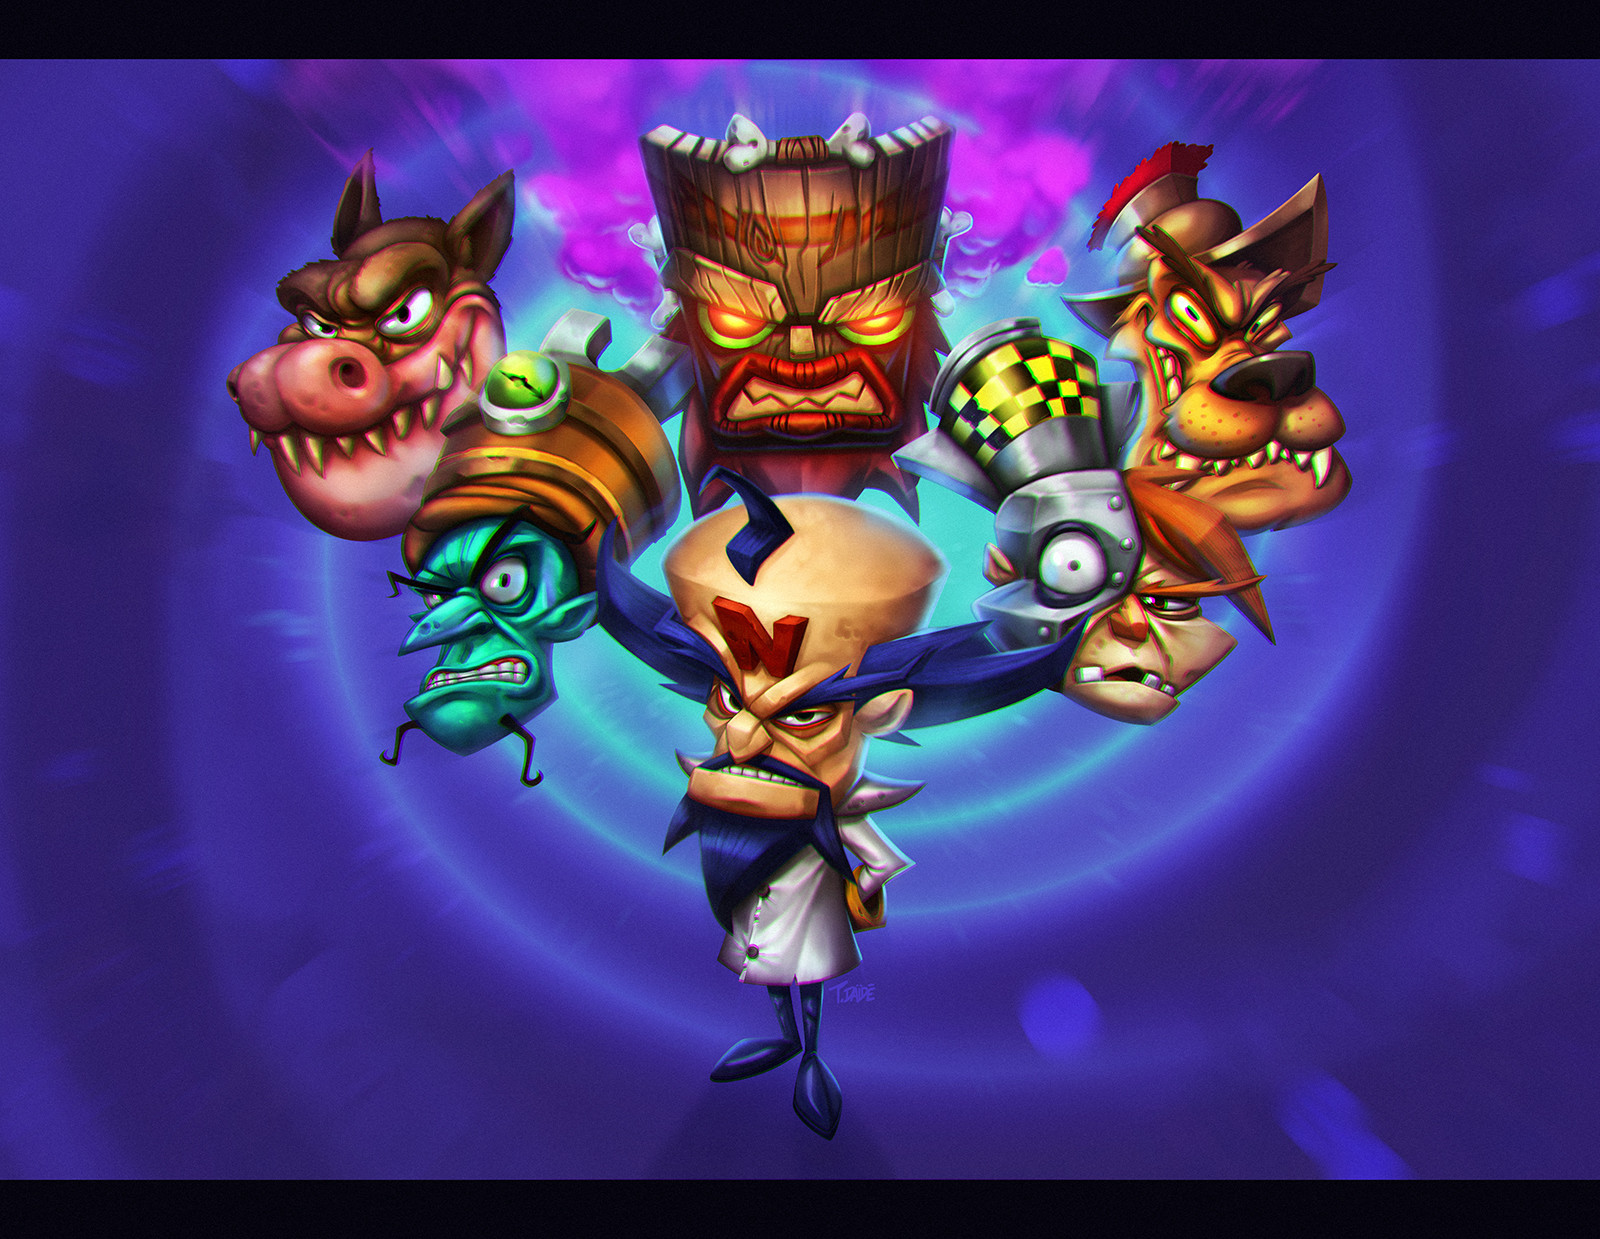 Crash Bandicoot Tribute